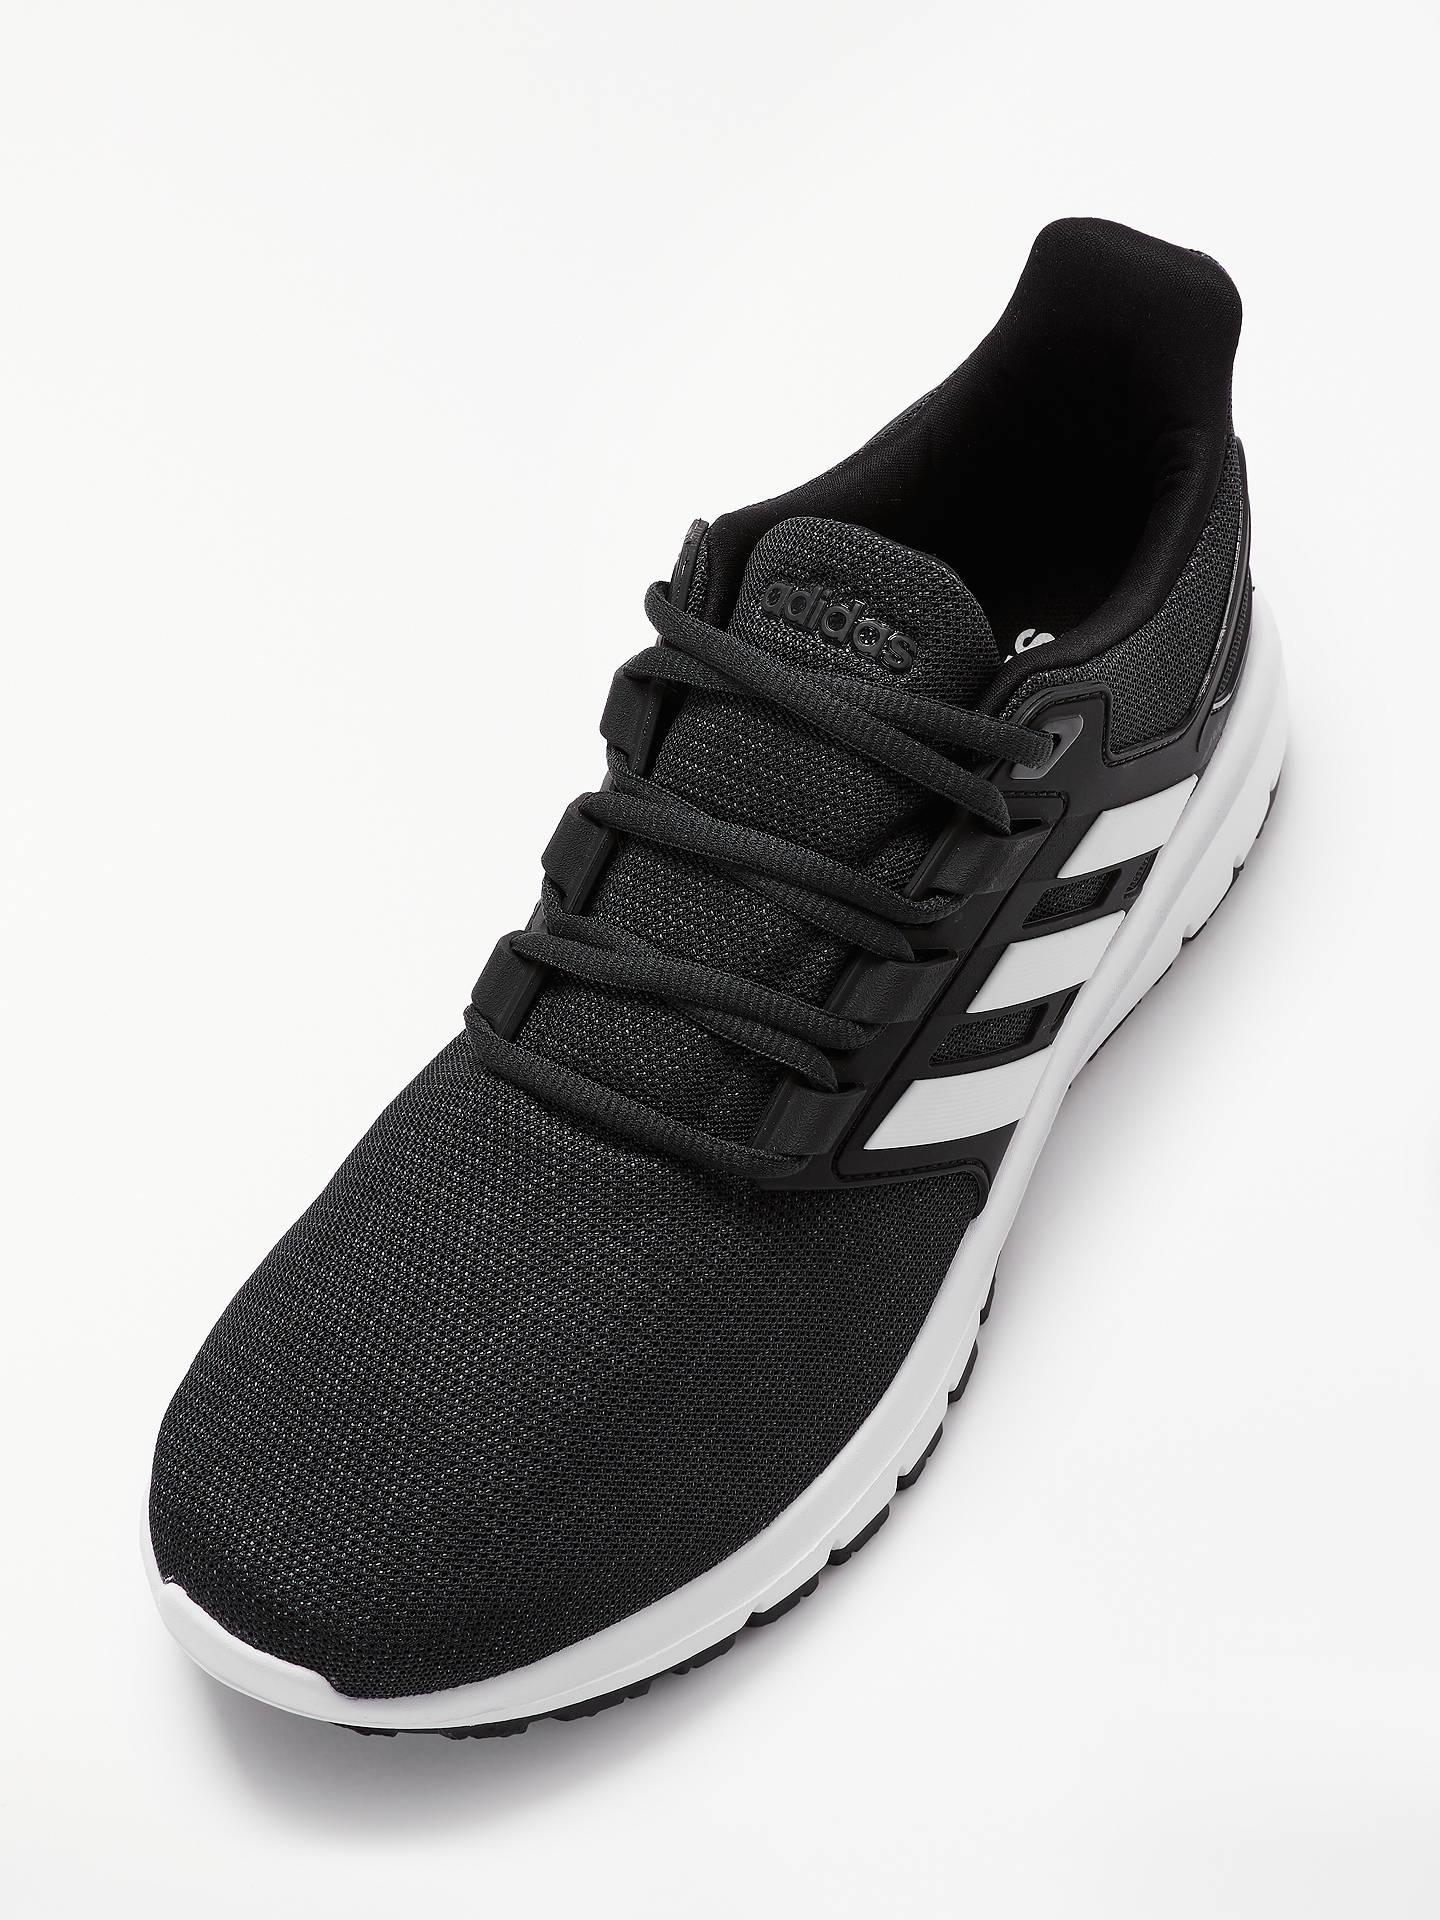 32719a36 ... Buy adidas Energy Cloud 2 Men's Running Shoes, Core Black/Carbon, 7  Online ...